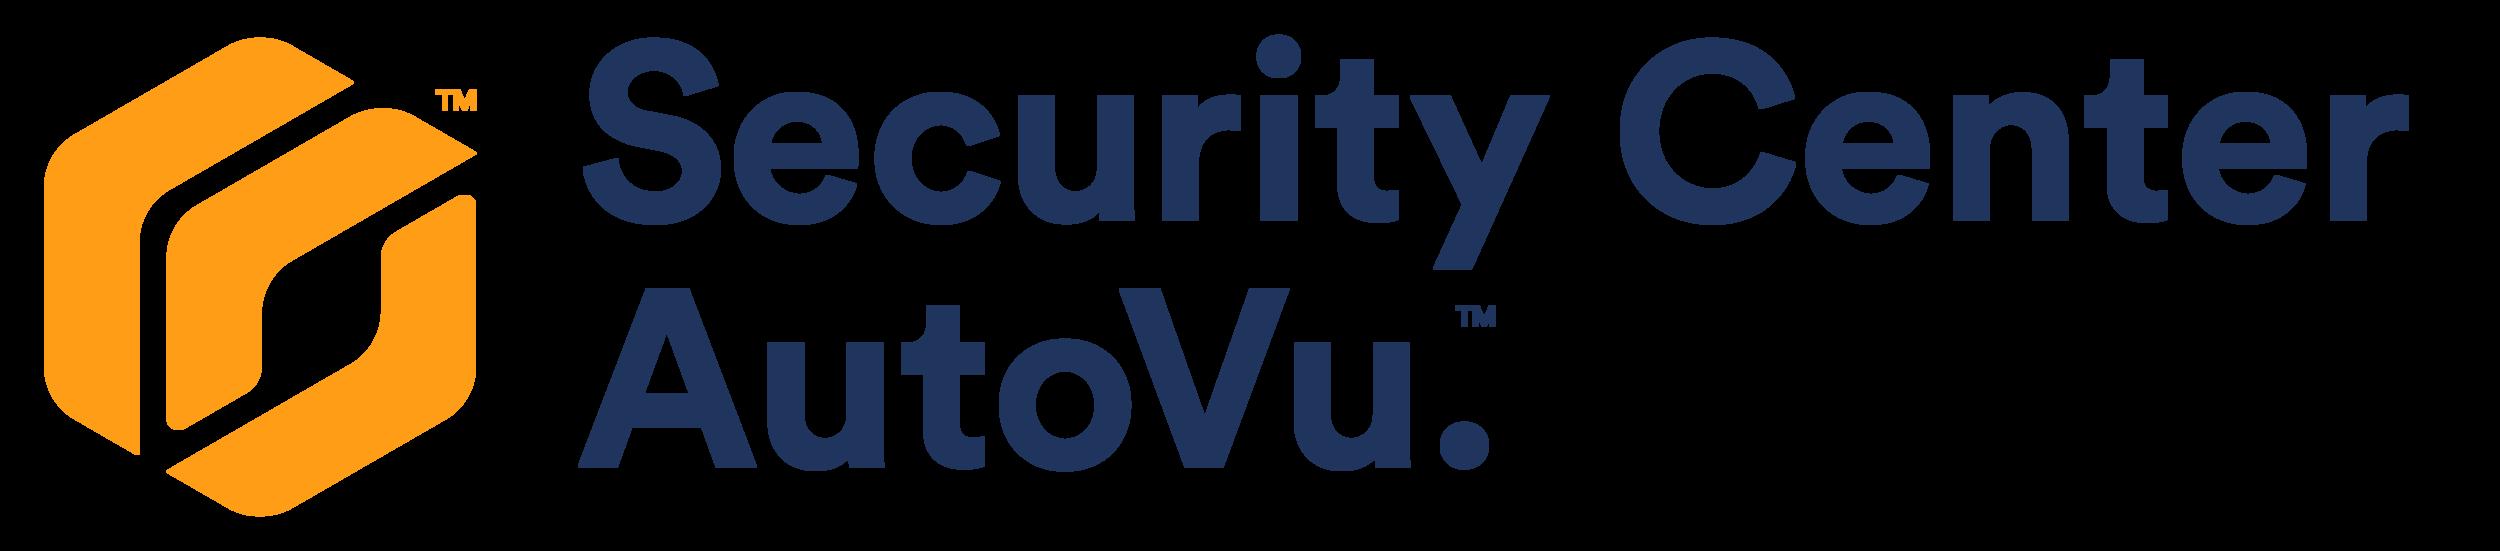 Security Center AutoVu logo- colour RGB.png